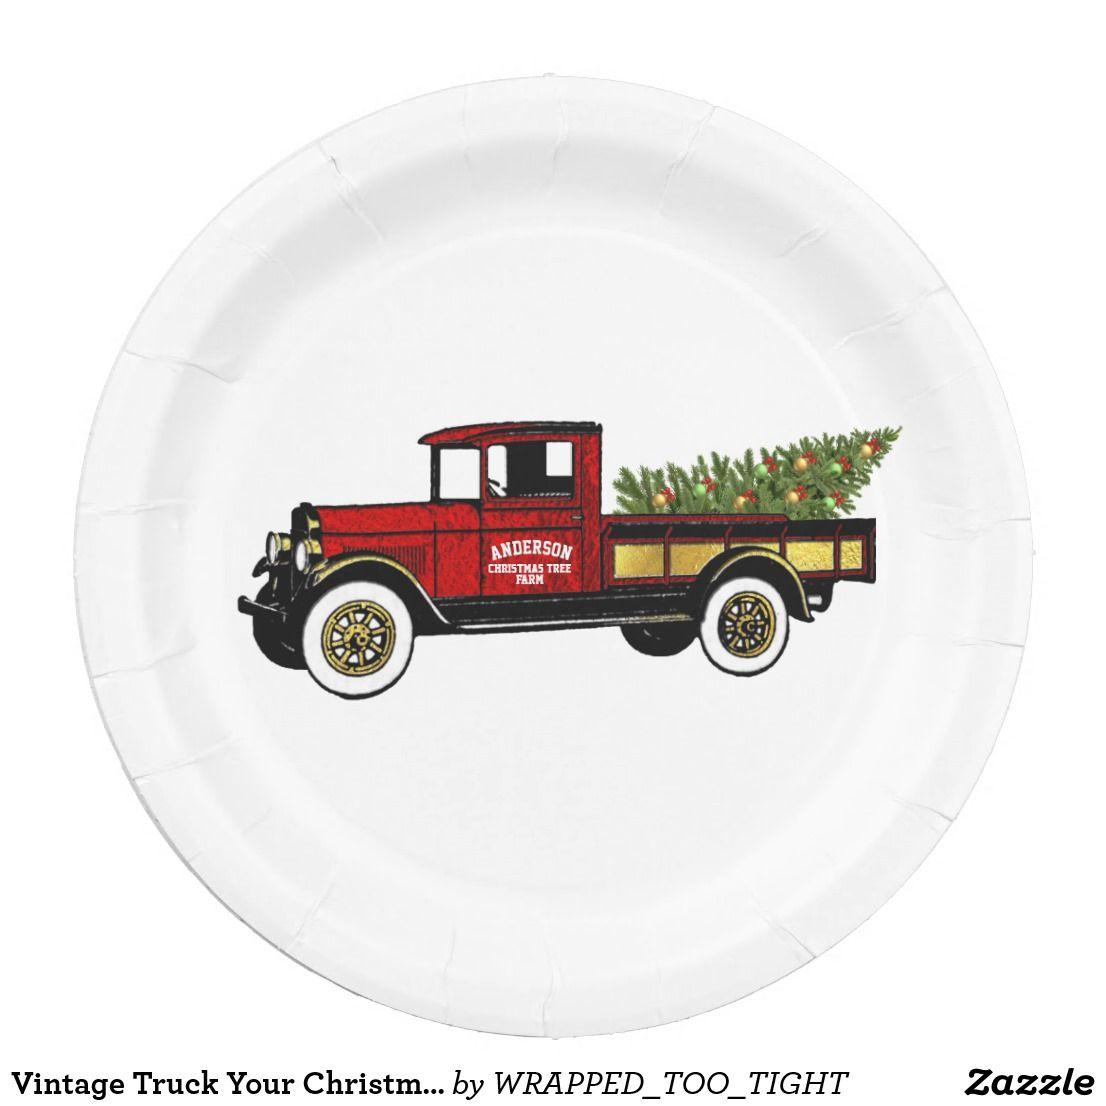 Vintage Truck Your Christmas Tree Farm Paper Plate Zazzle Com Christmas Tree Farm Vintage Truck Tree Farms